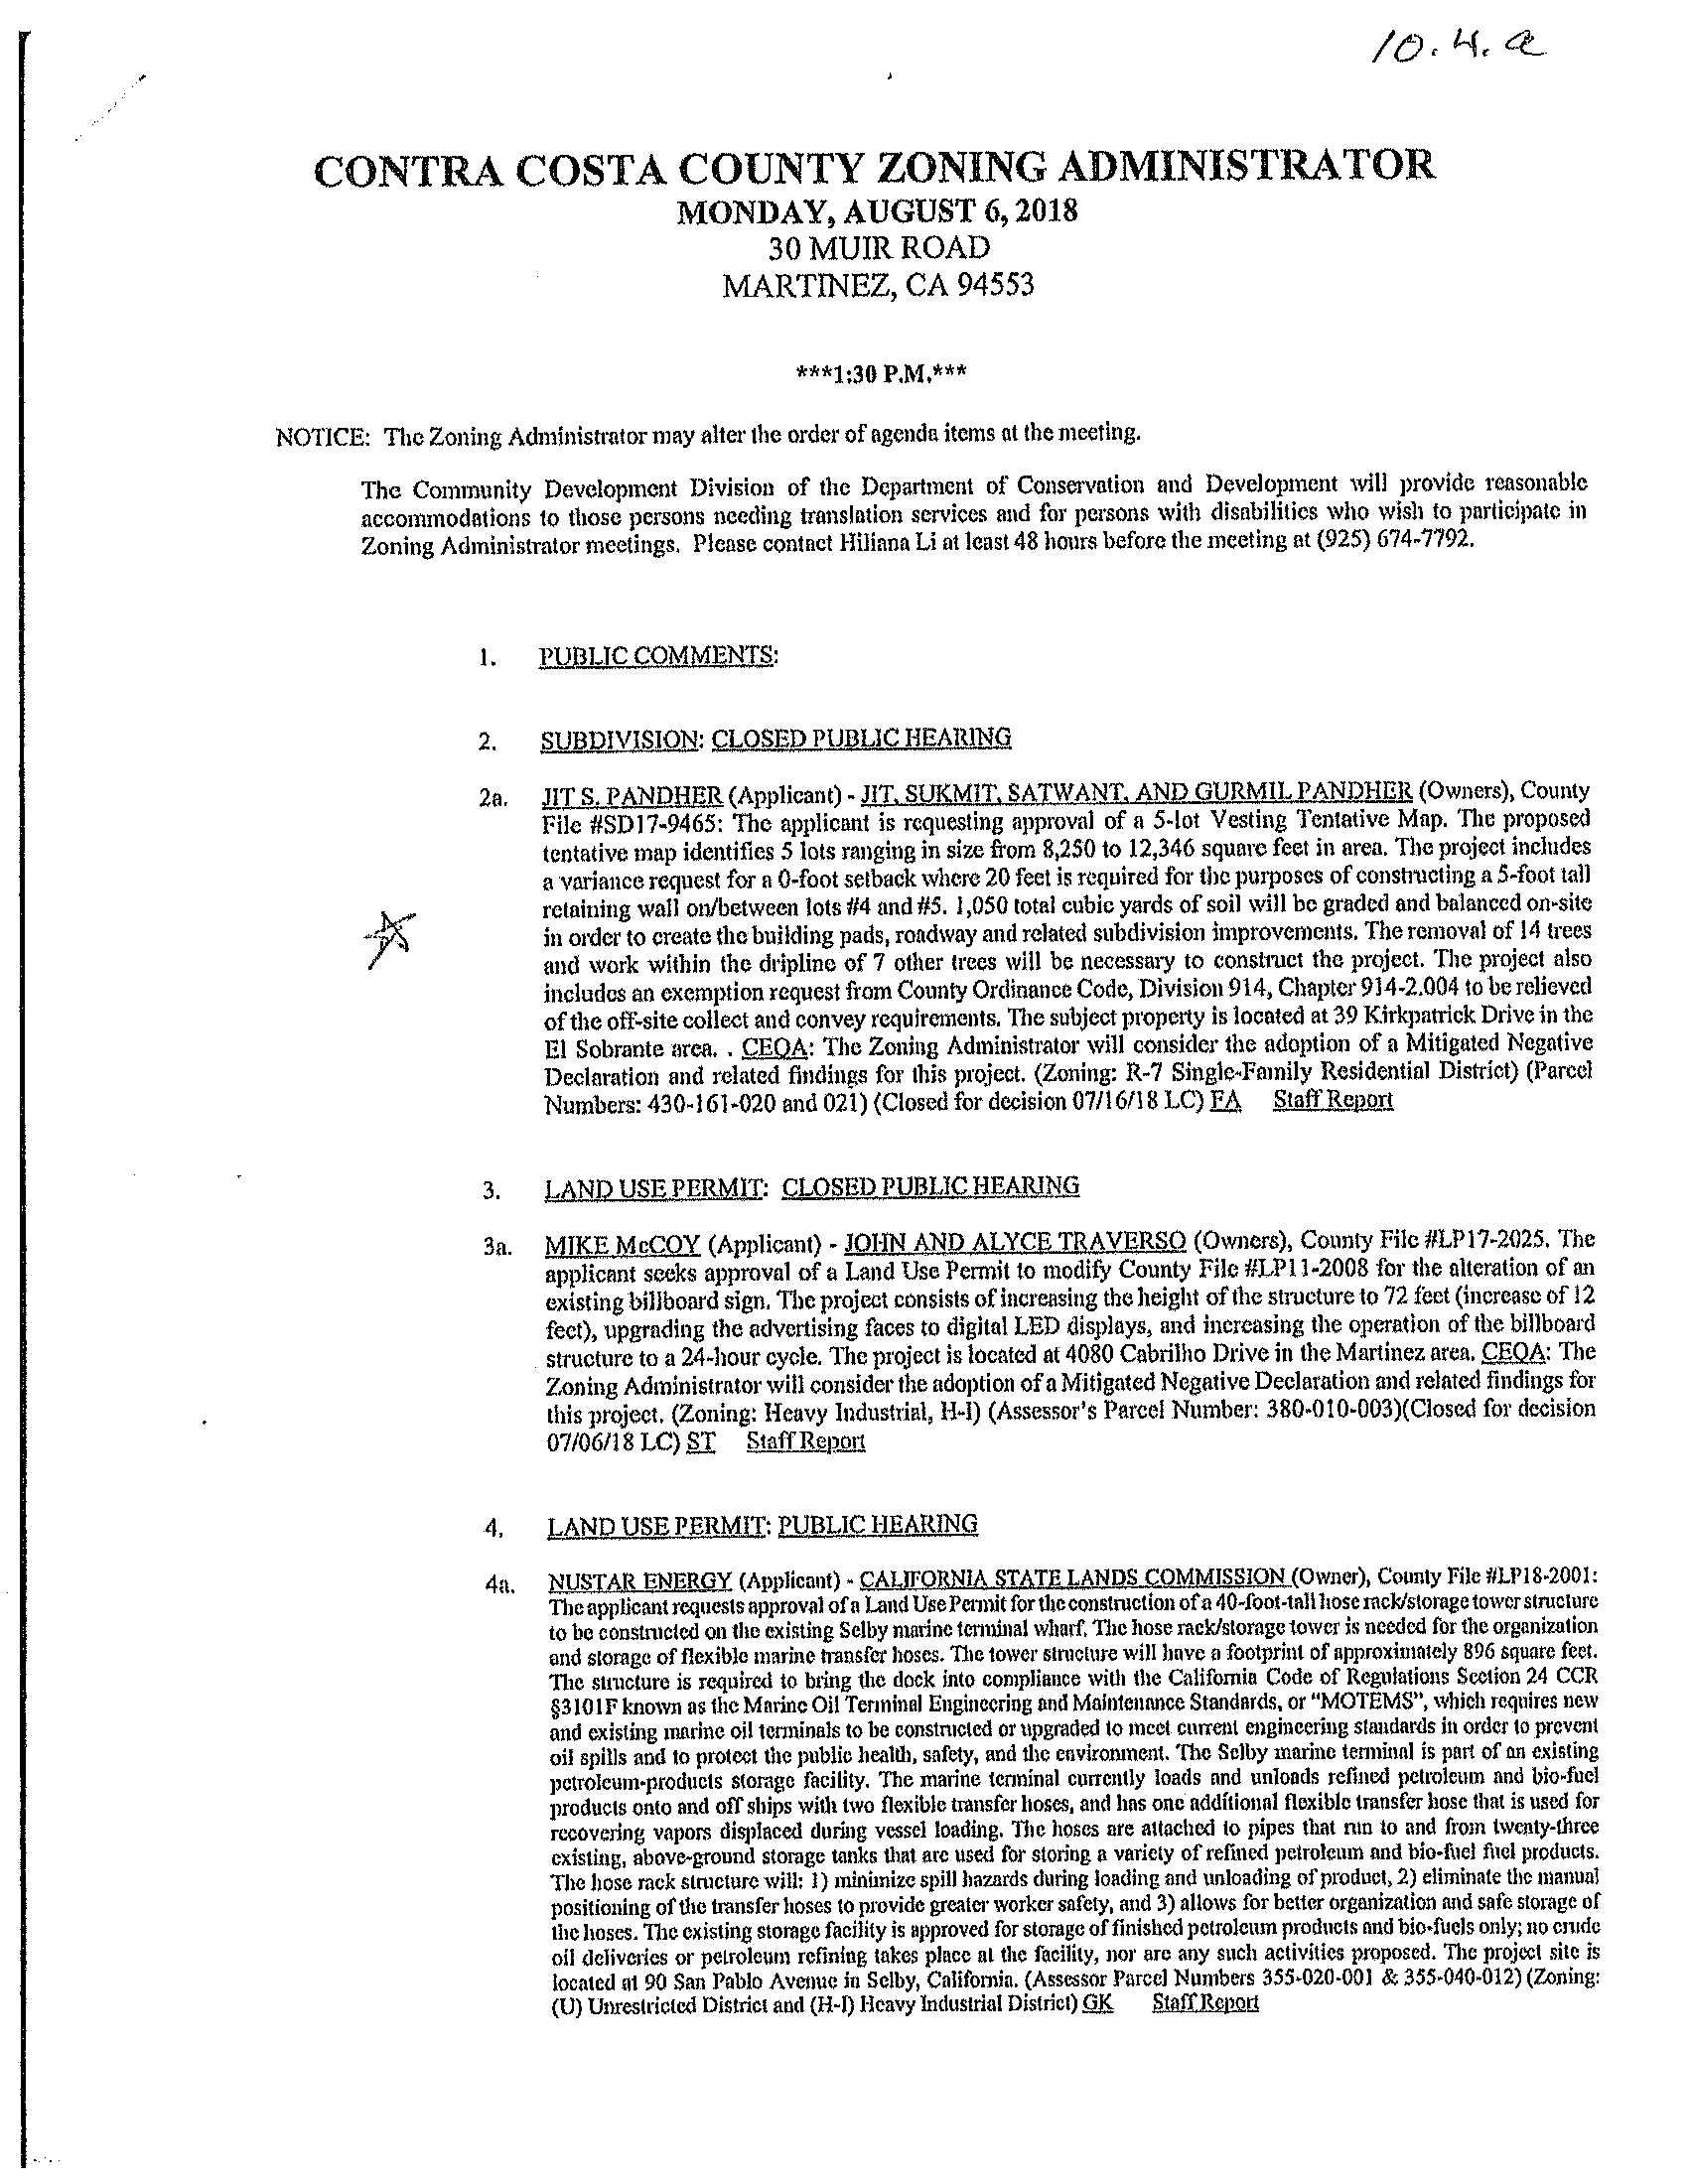 ESMAC Agenda 08.08.2018 (17 Pages)_16.jpg